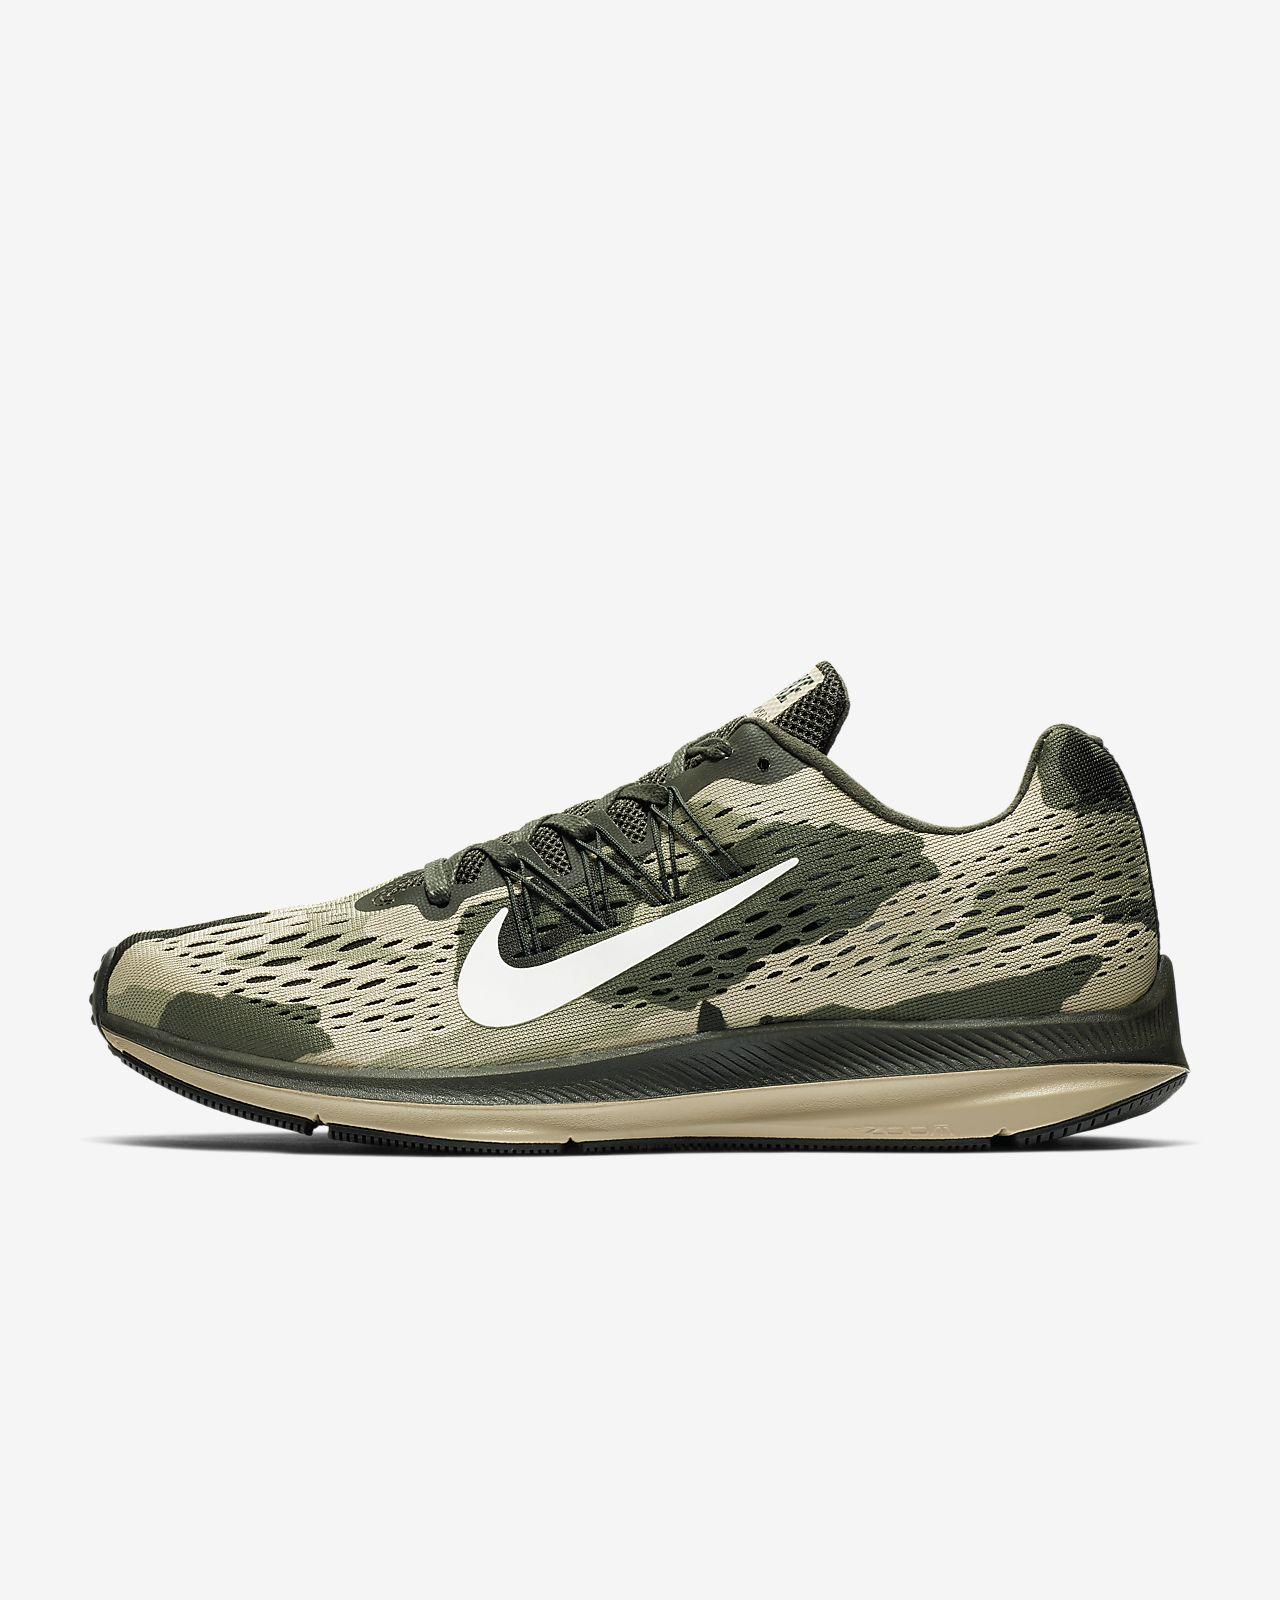 best cheap 63b8c b3147 ... Nike Air Zoom Winflo 5 Camo Mens Running Shoe